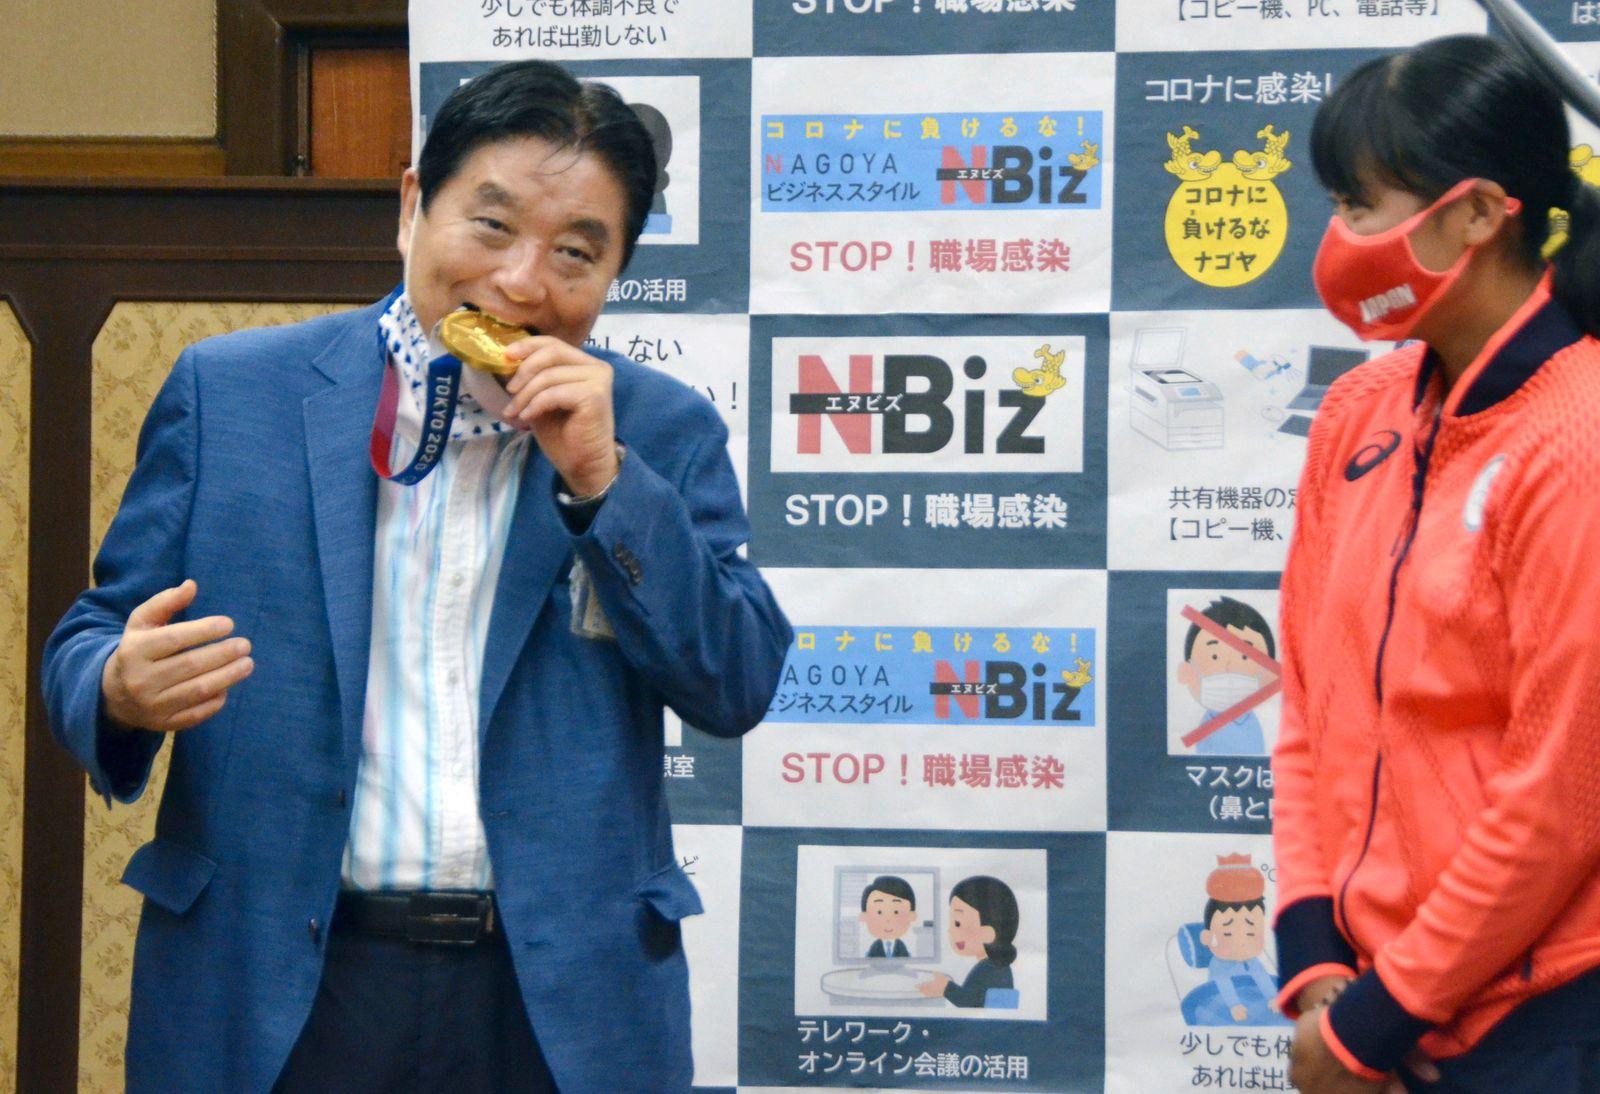 Nagoya city Mayor Takashi Kawamura bites the Tokyo 2020 Olympic Games gold medal of the softball athlete Miu Goto in Nagoya, Japan